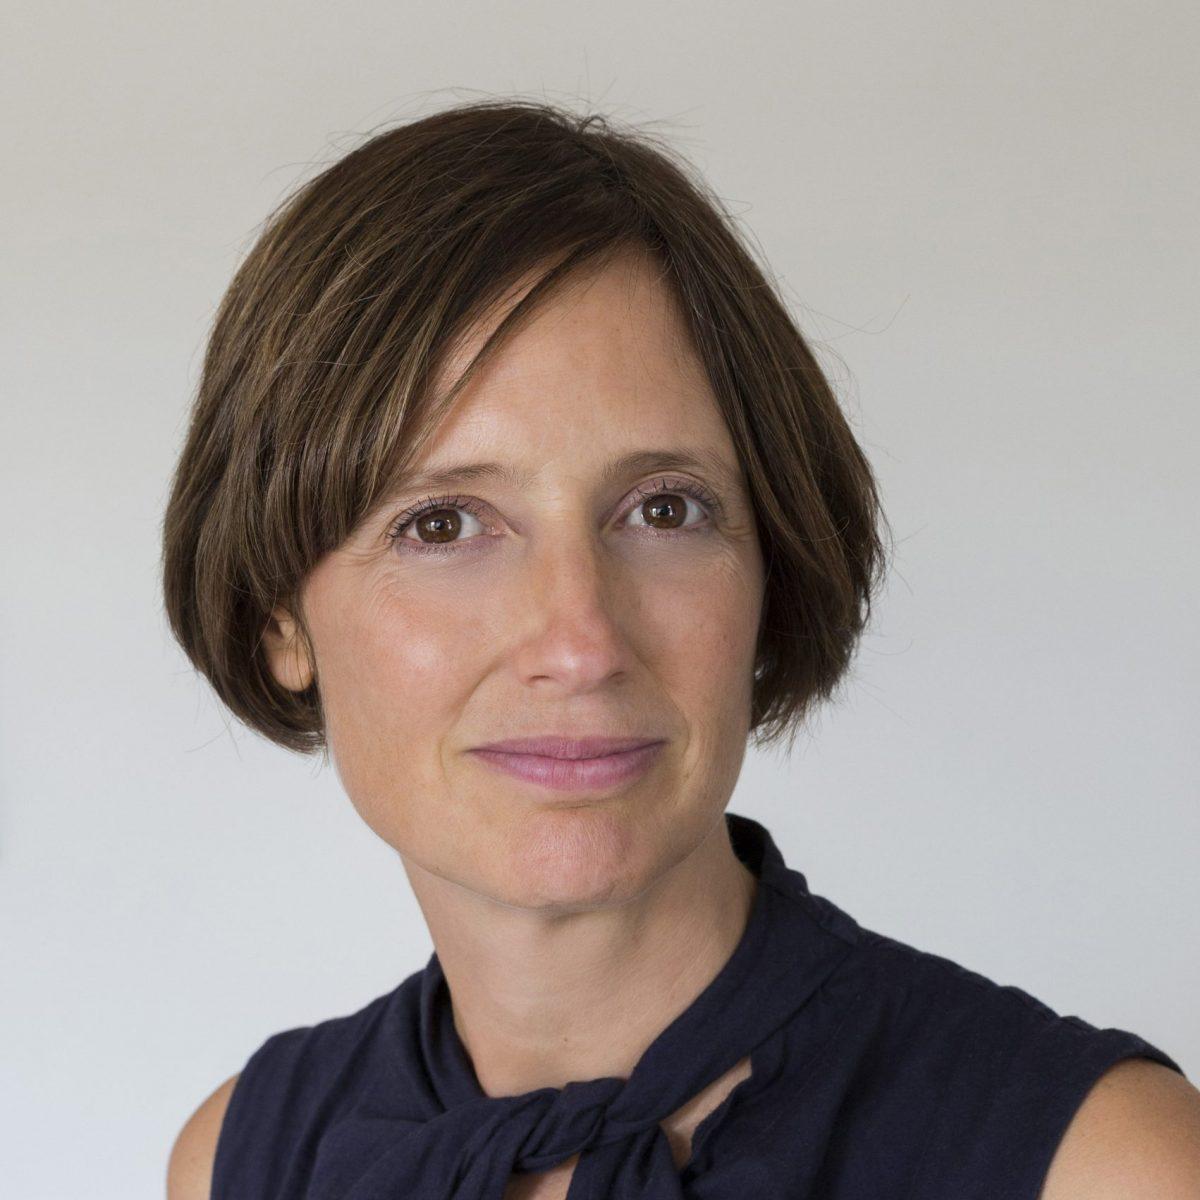 FARA Trustee Hannah Middleton